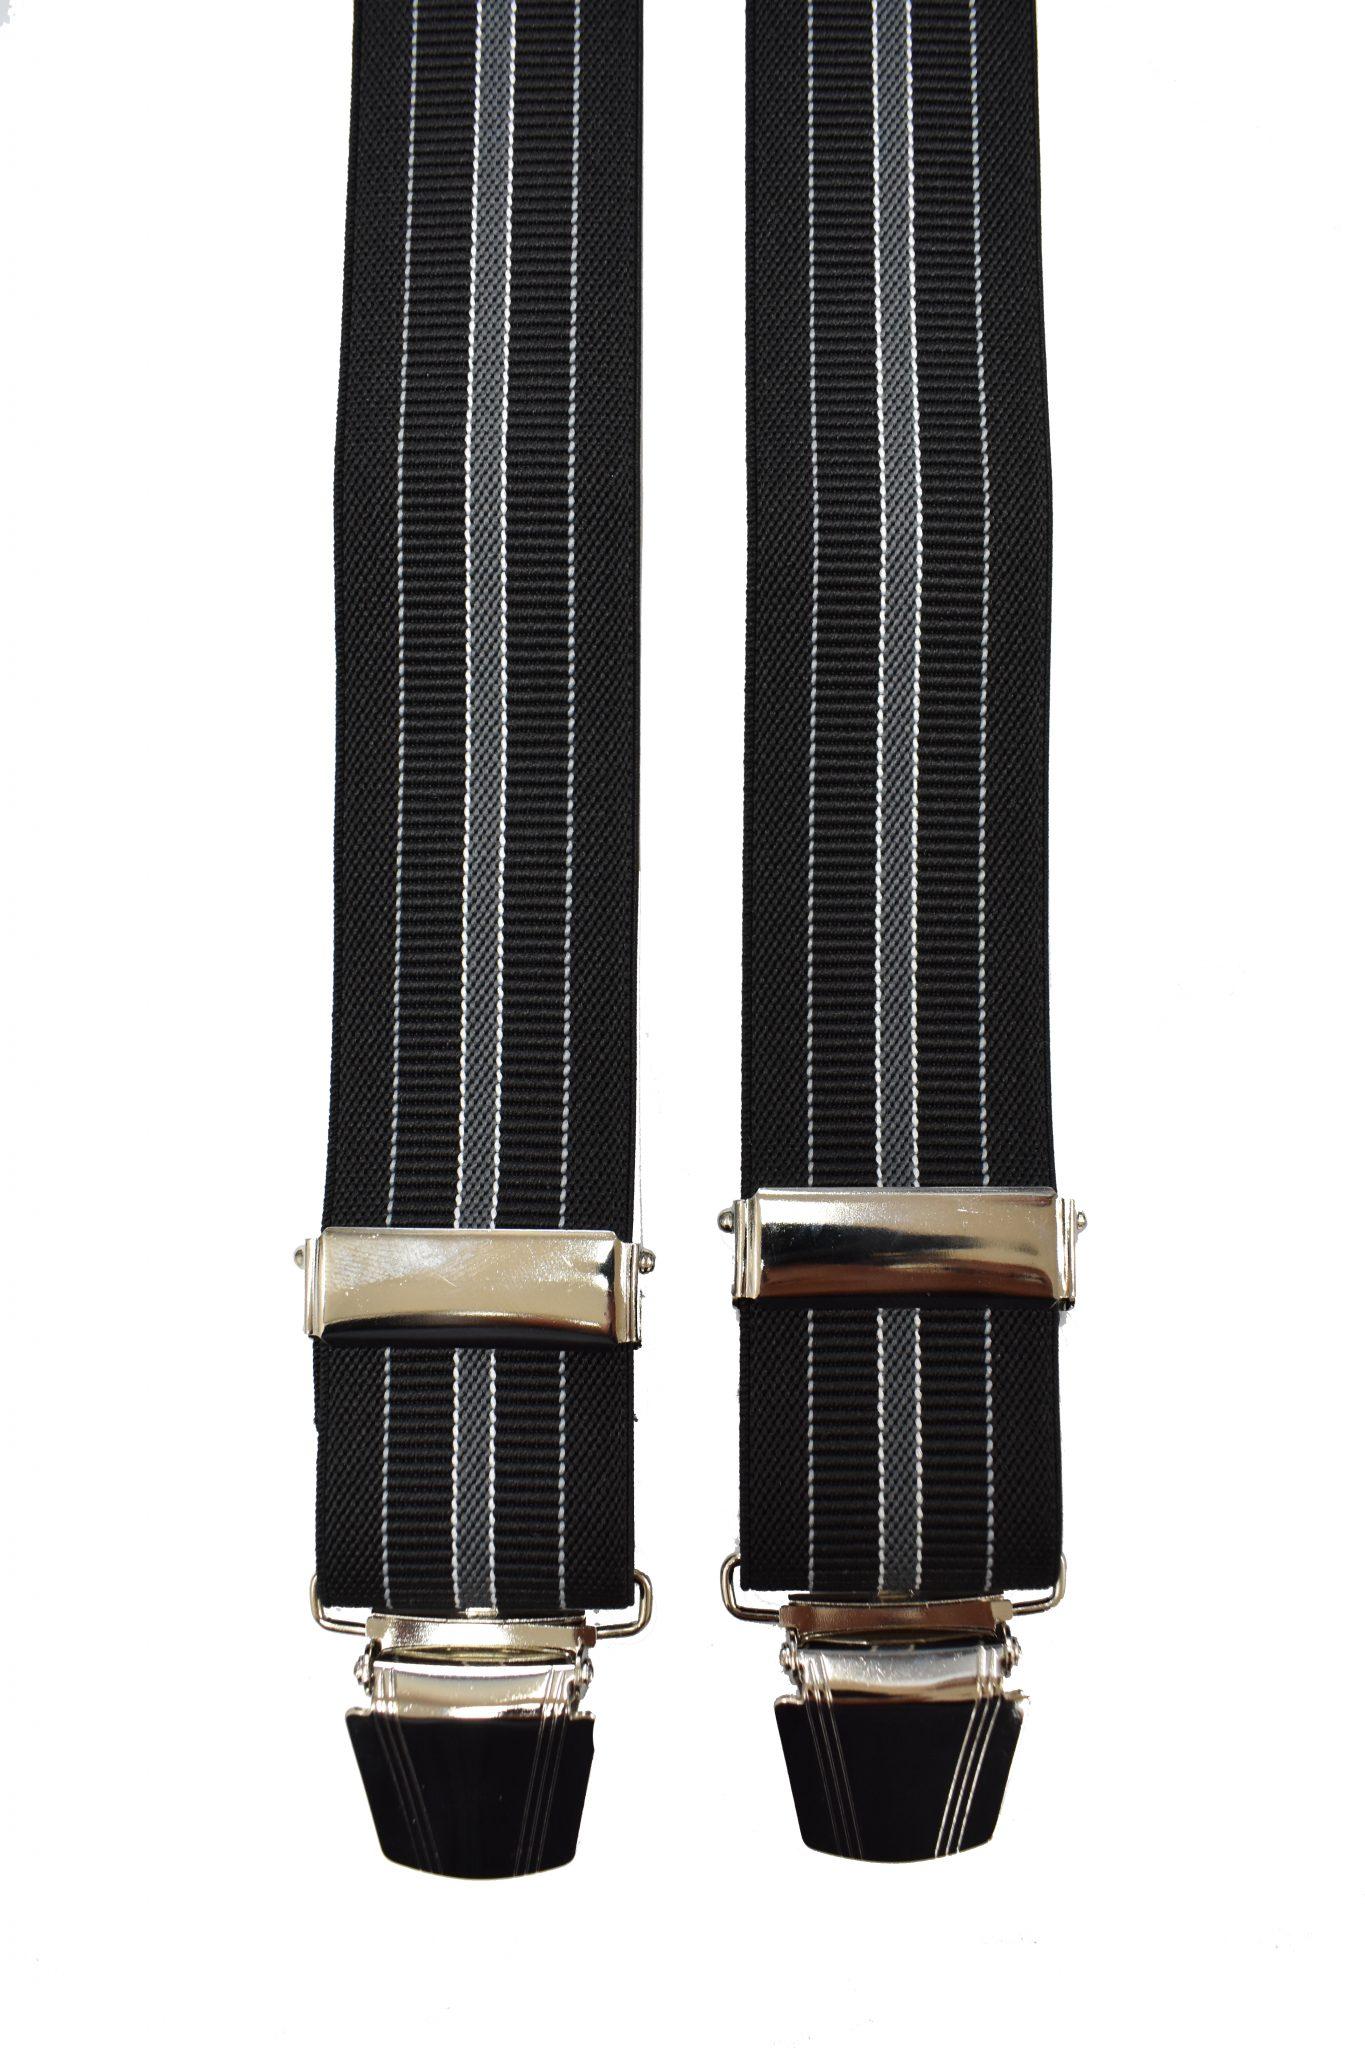 Extra lange bretels zwart en grijze lengte streep